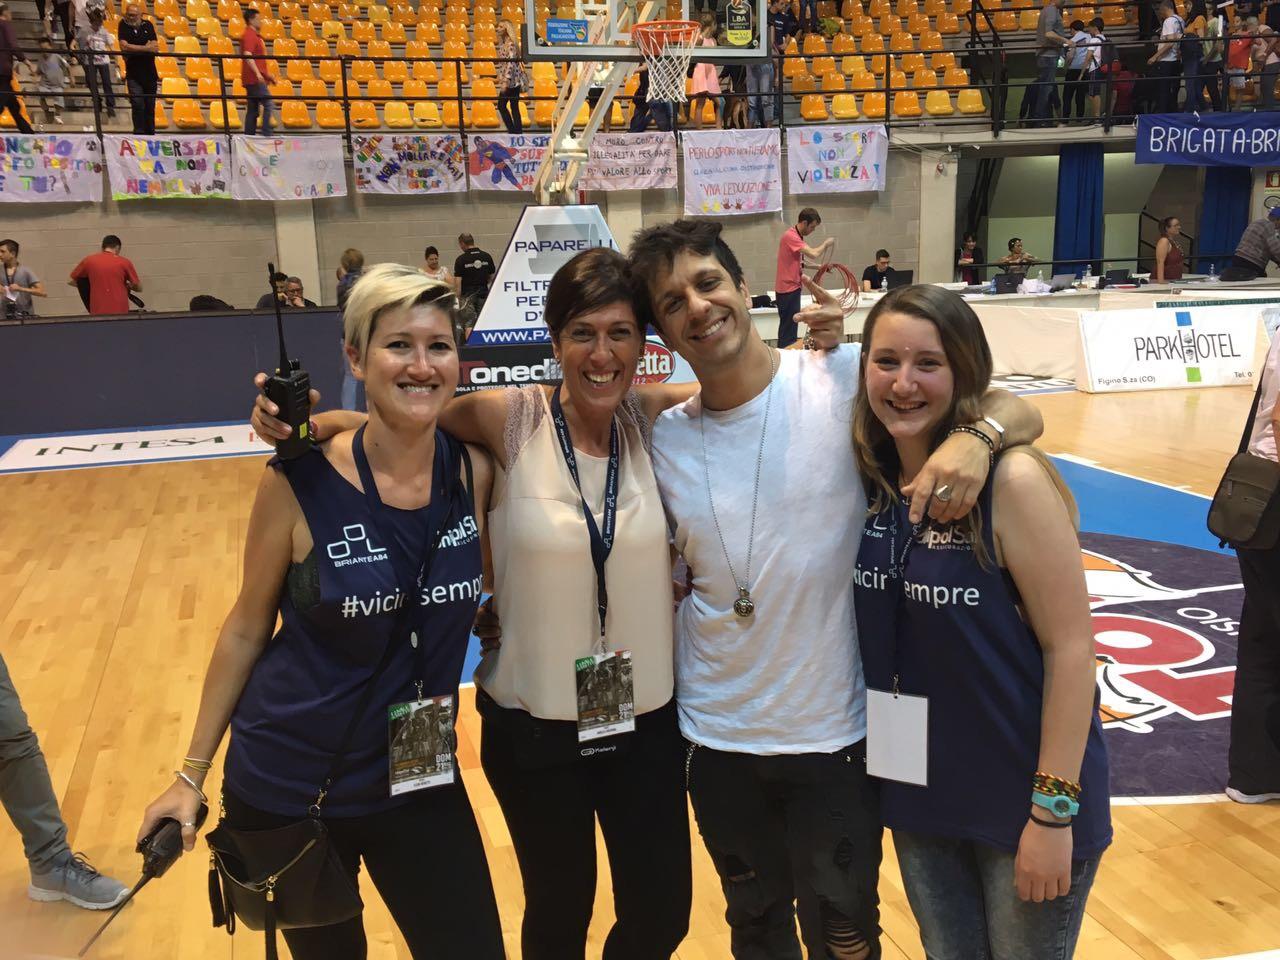 Basket in carrozzina 2017-18: l'UnipolSai Briantea84 Cantù lancia